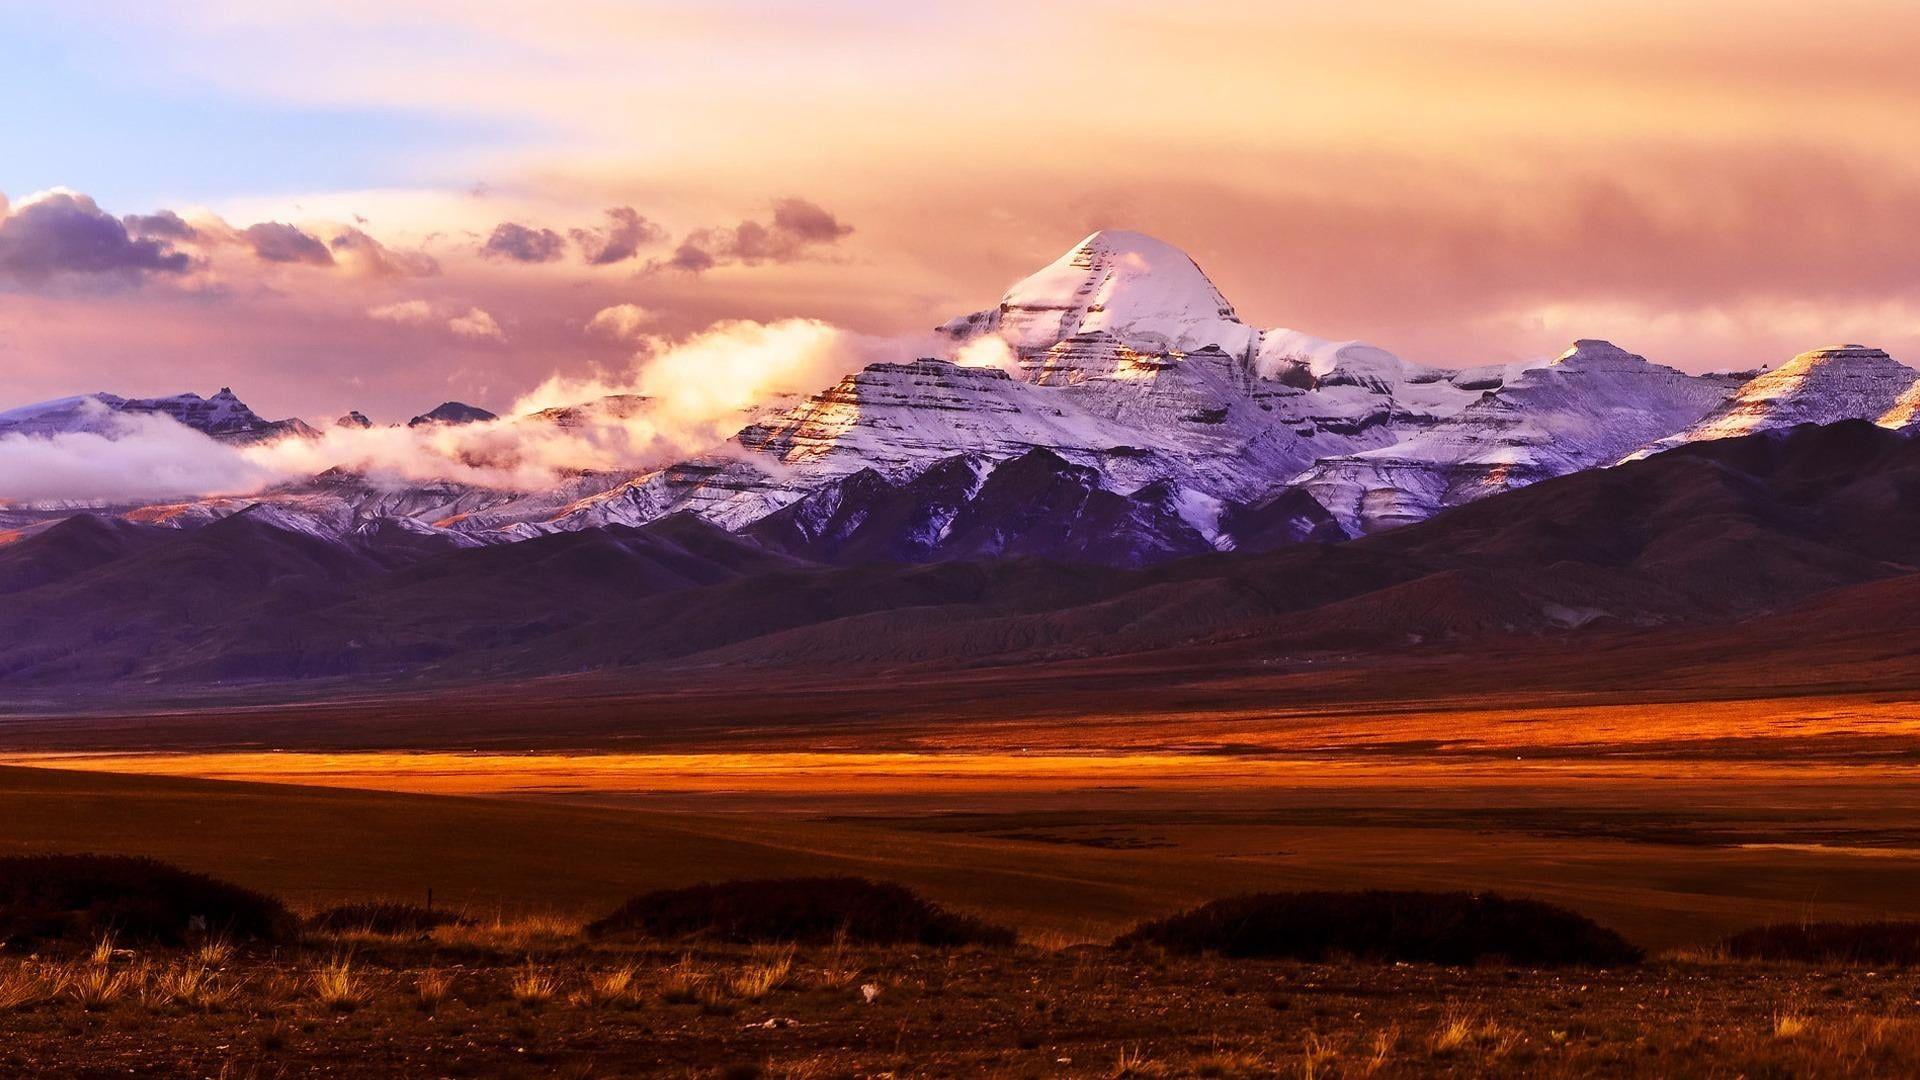 Mountains Snow Bagaxiang Gang Rinpoche Burang Ngari Tibet China Asia Mt Kailash Kailash Mountain Range Mo In 2020 Tibet Travel Iceland Trekking Trekking Tour